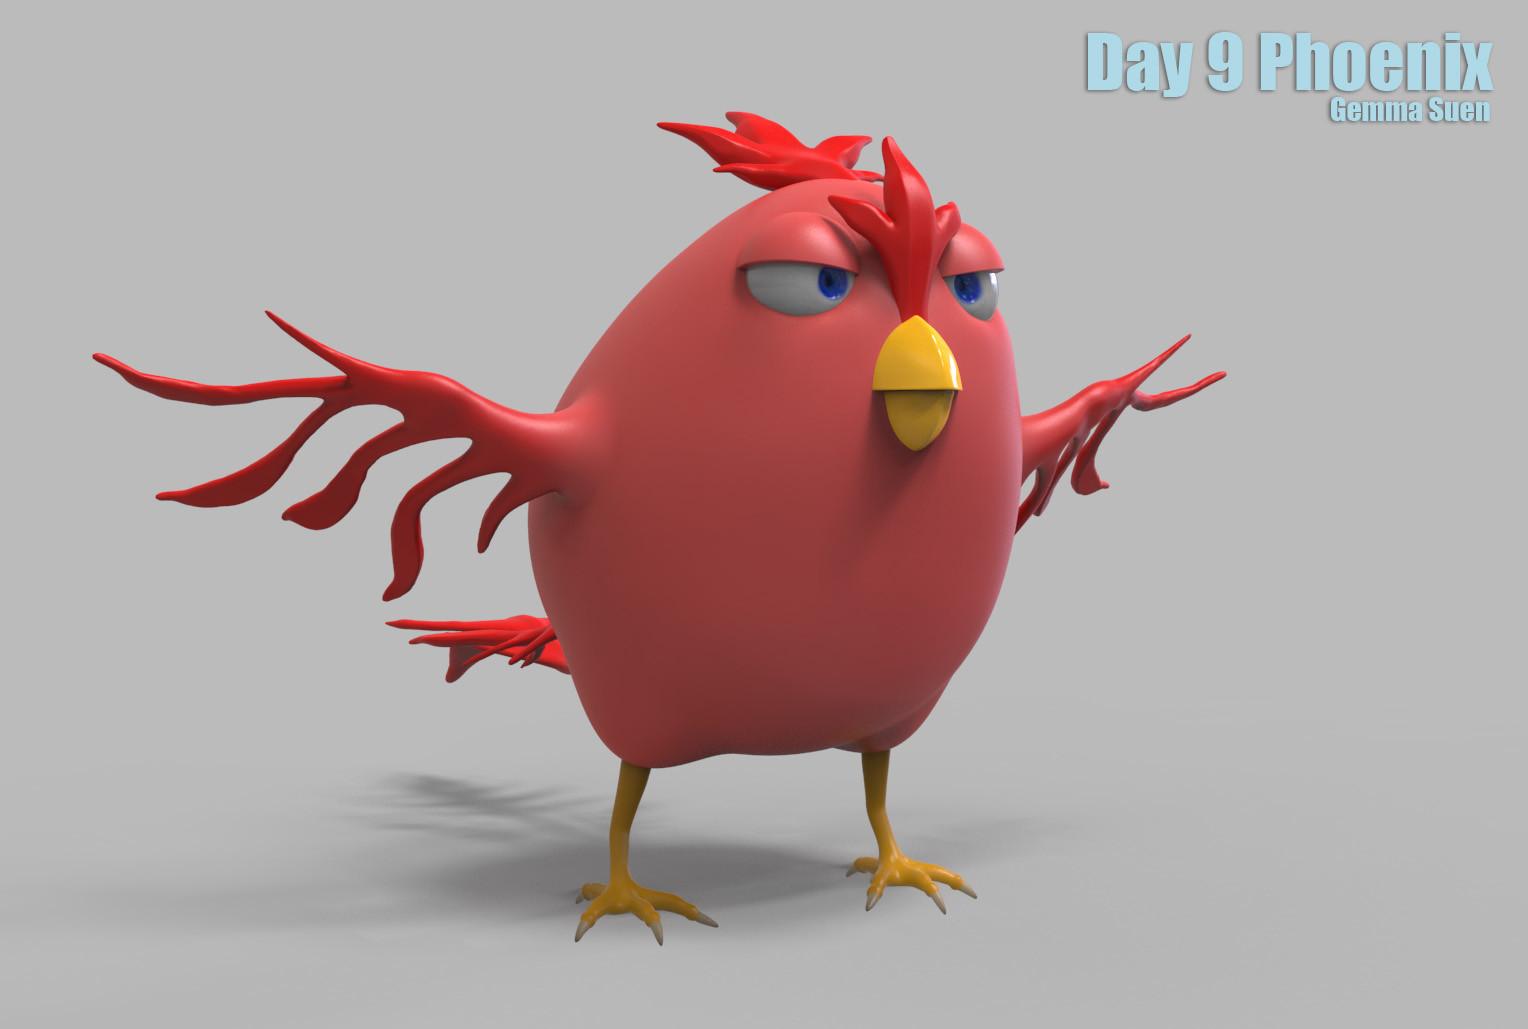 Gemma suen day9 phoenix